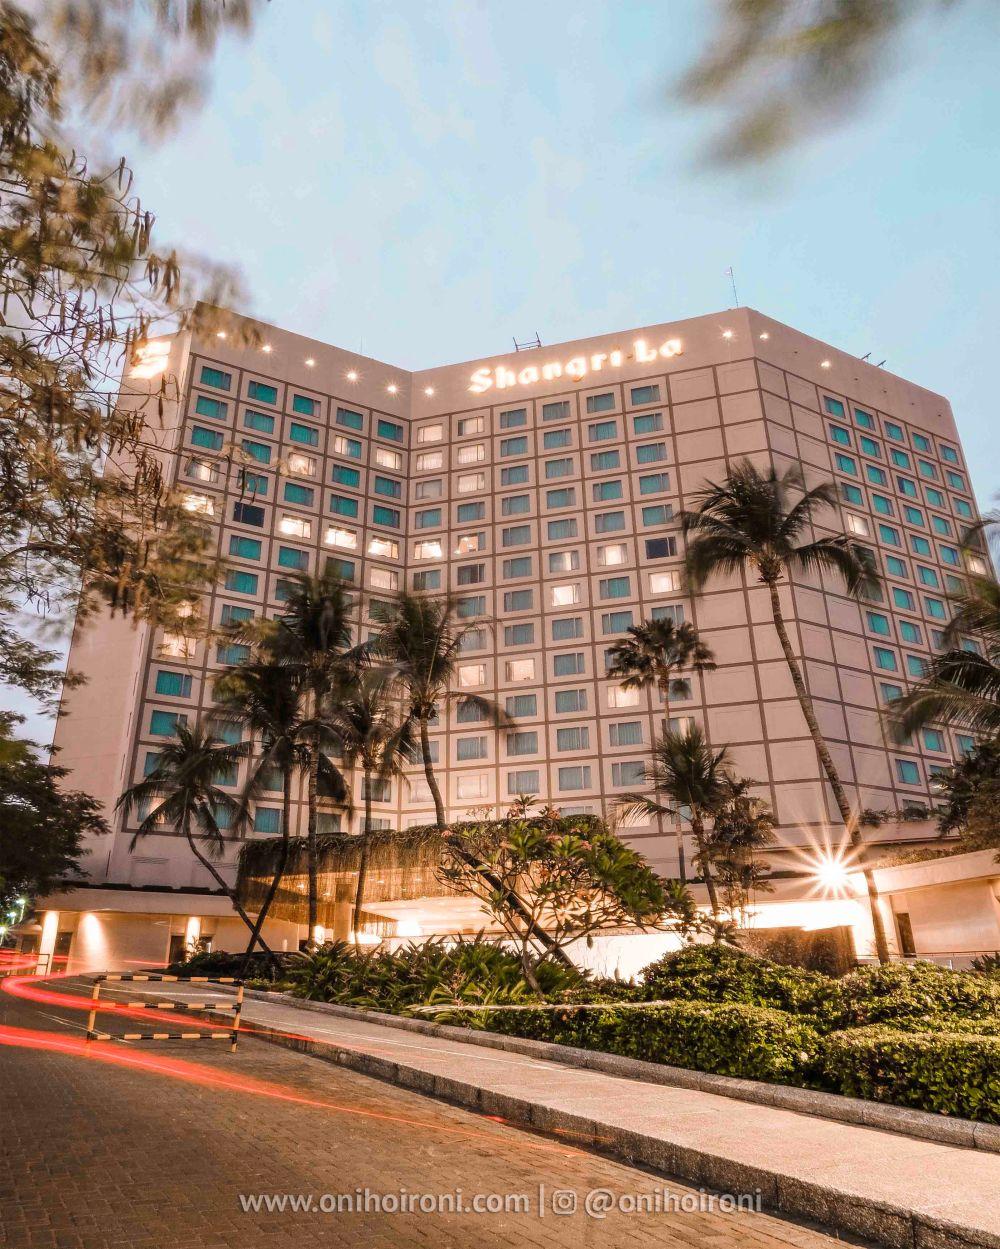 1 Gedung Review Shangrila Surabaya Hotel Oni hoironi.jpg